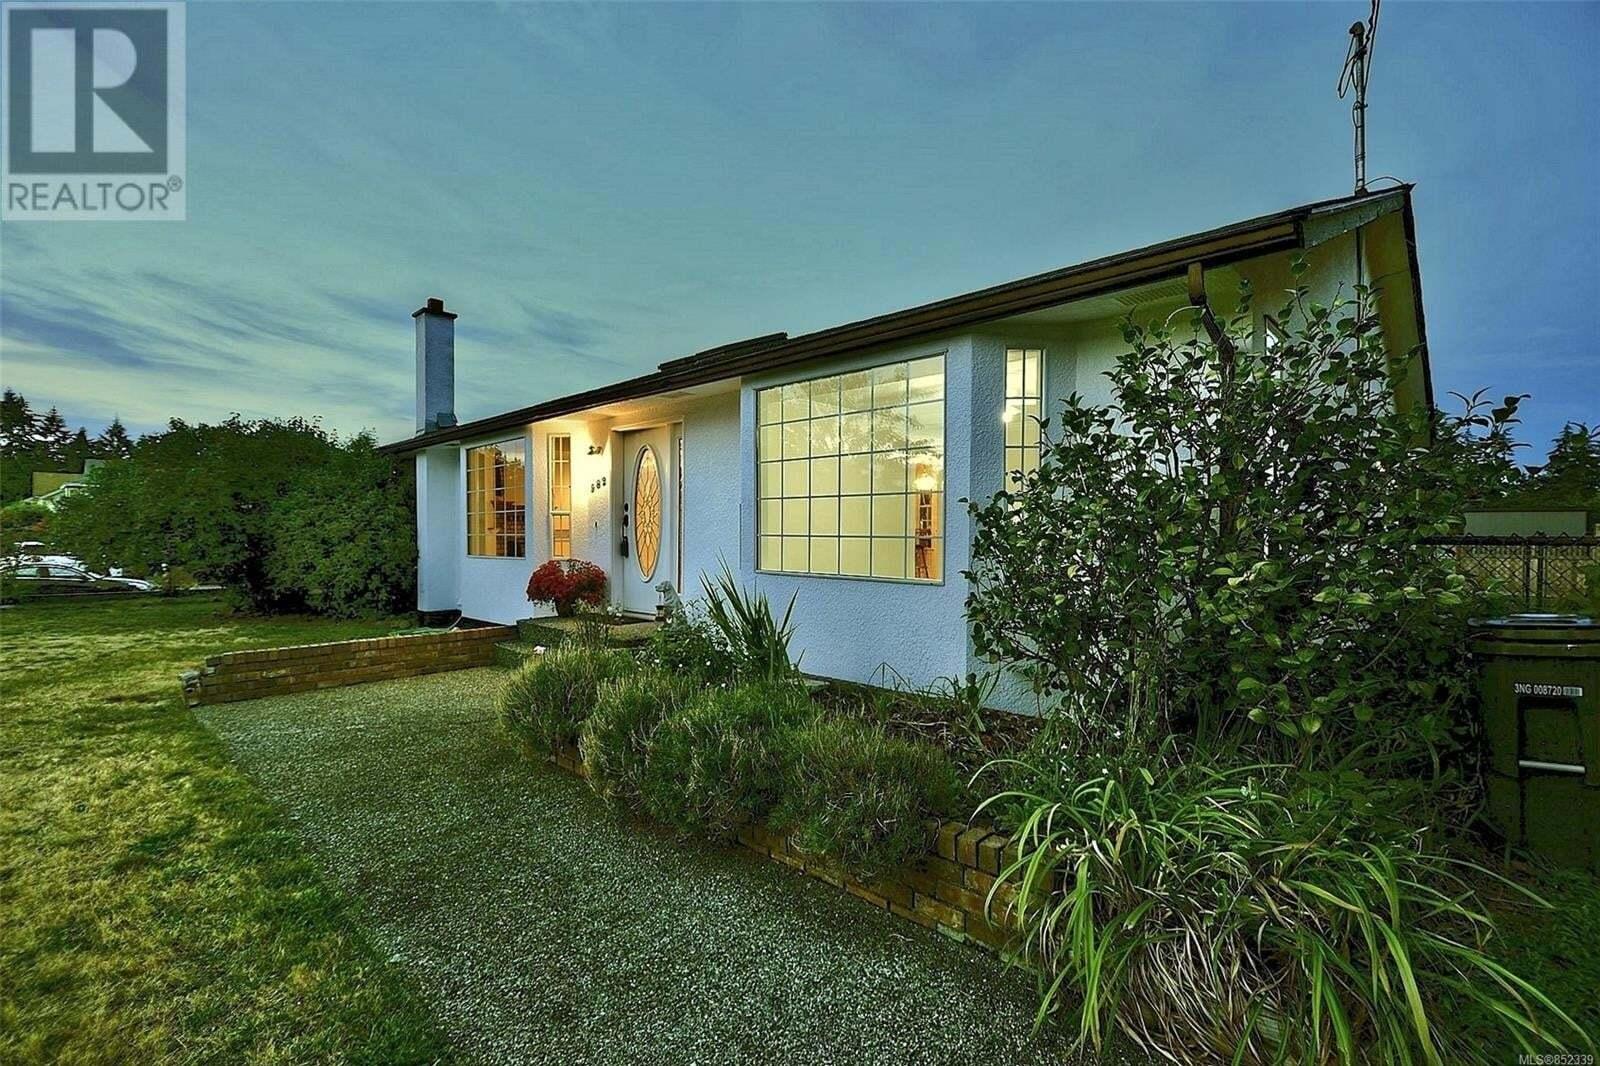 House for sale at 982 Douglas Ave Nanaimo British Columbia - MLS: 852339